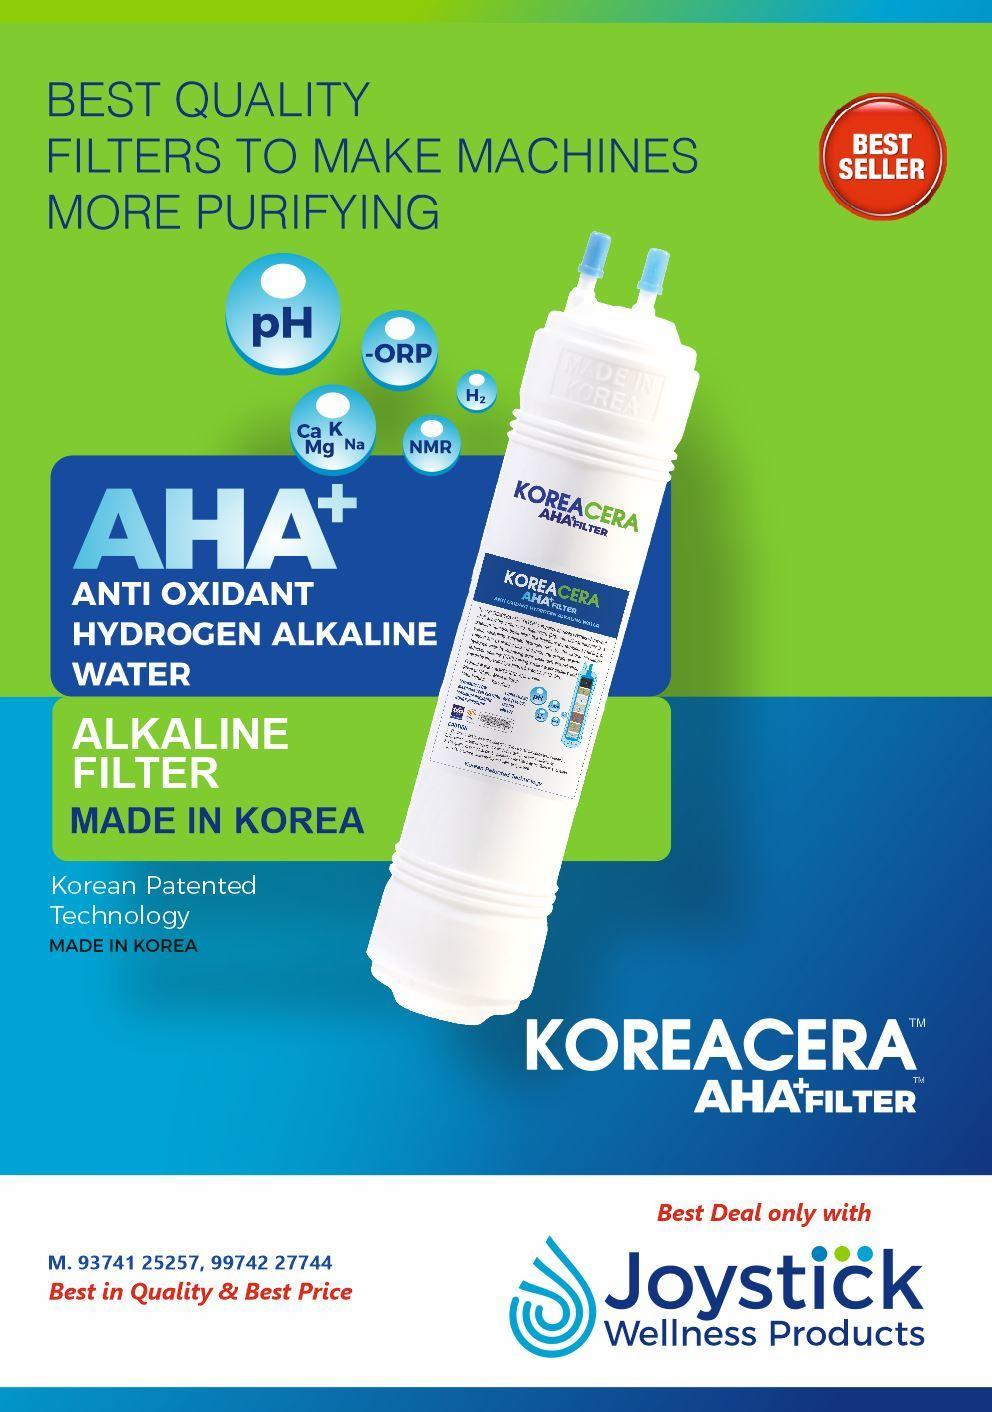 KOREACERA ANTIOXIDANT ALKALINE HYDROGEN WATER FILTER